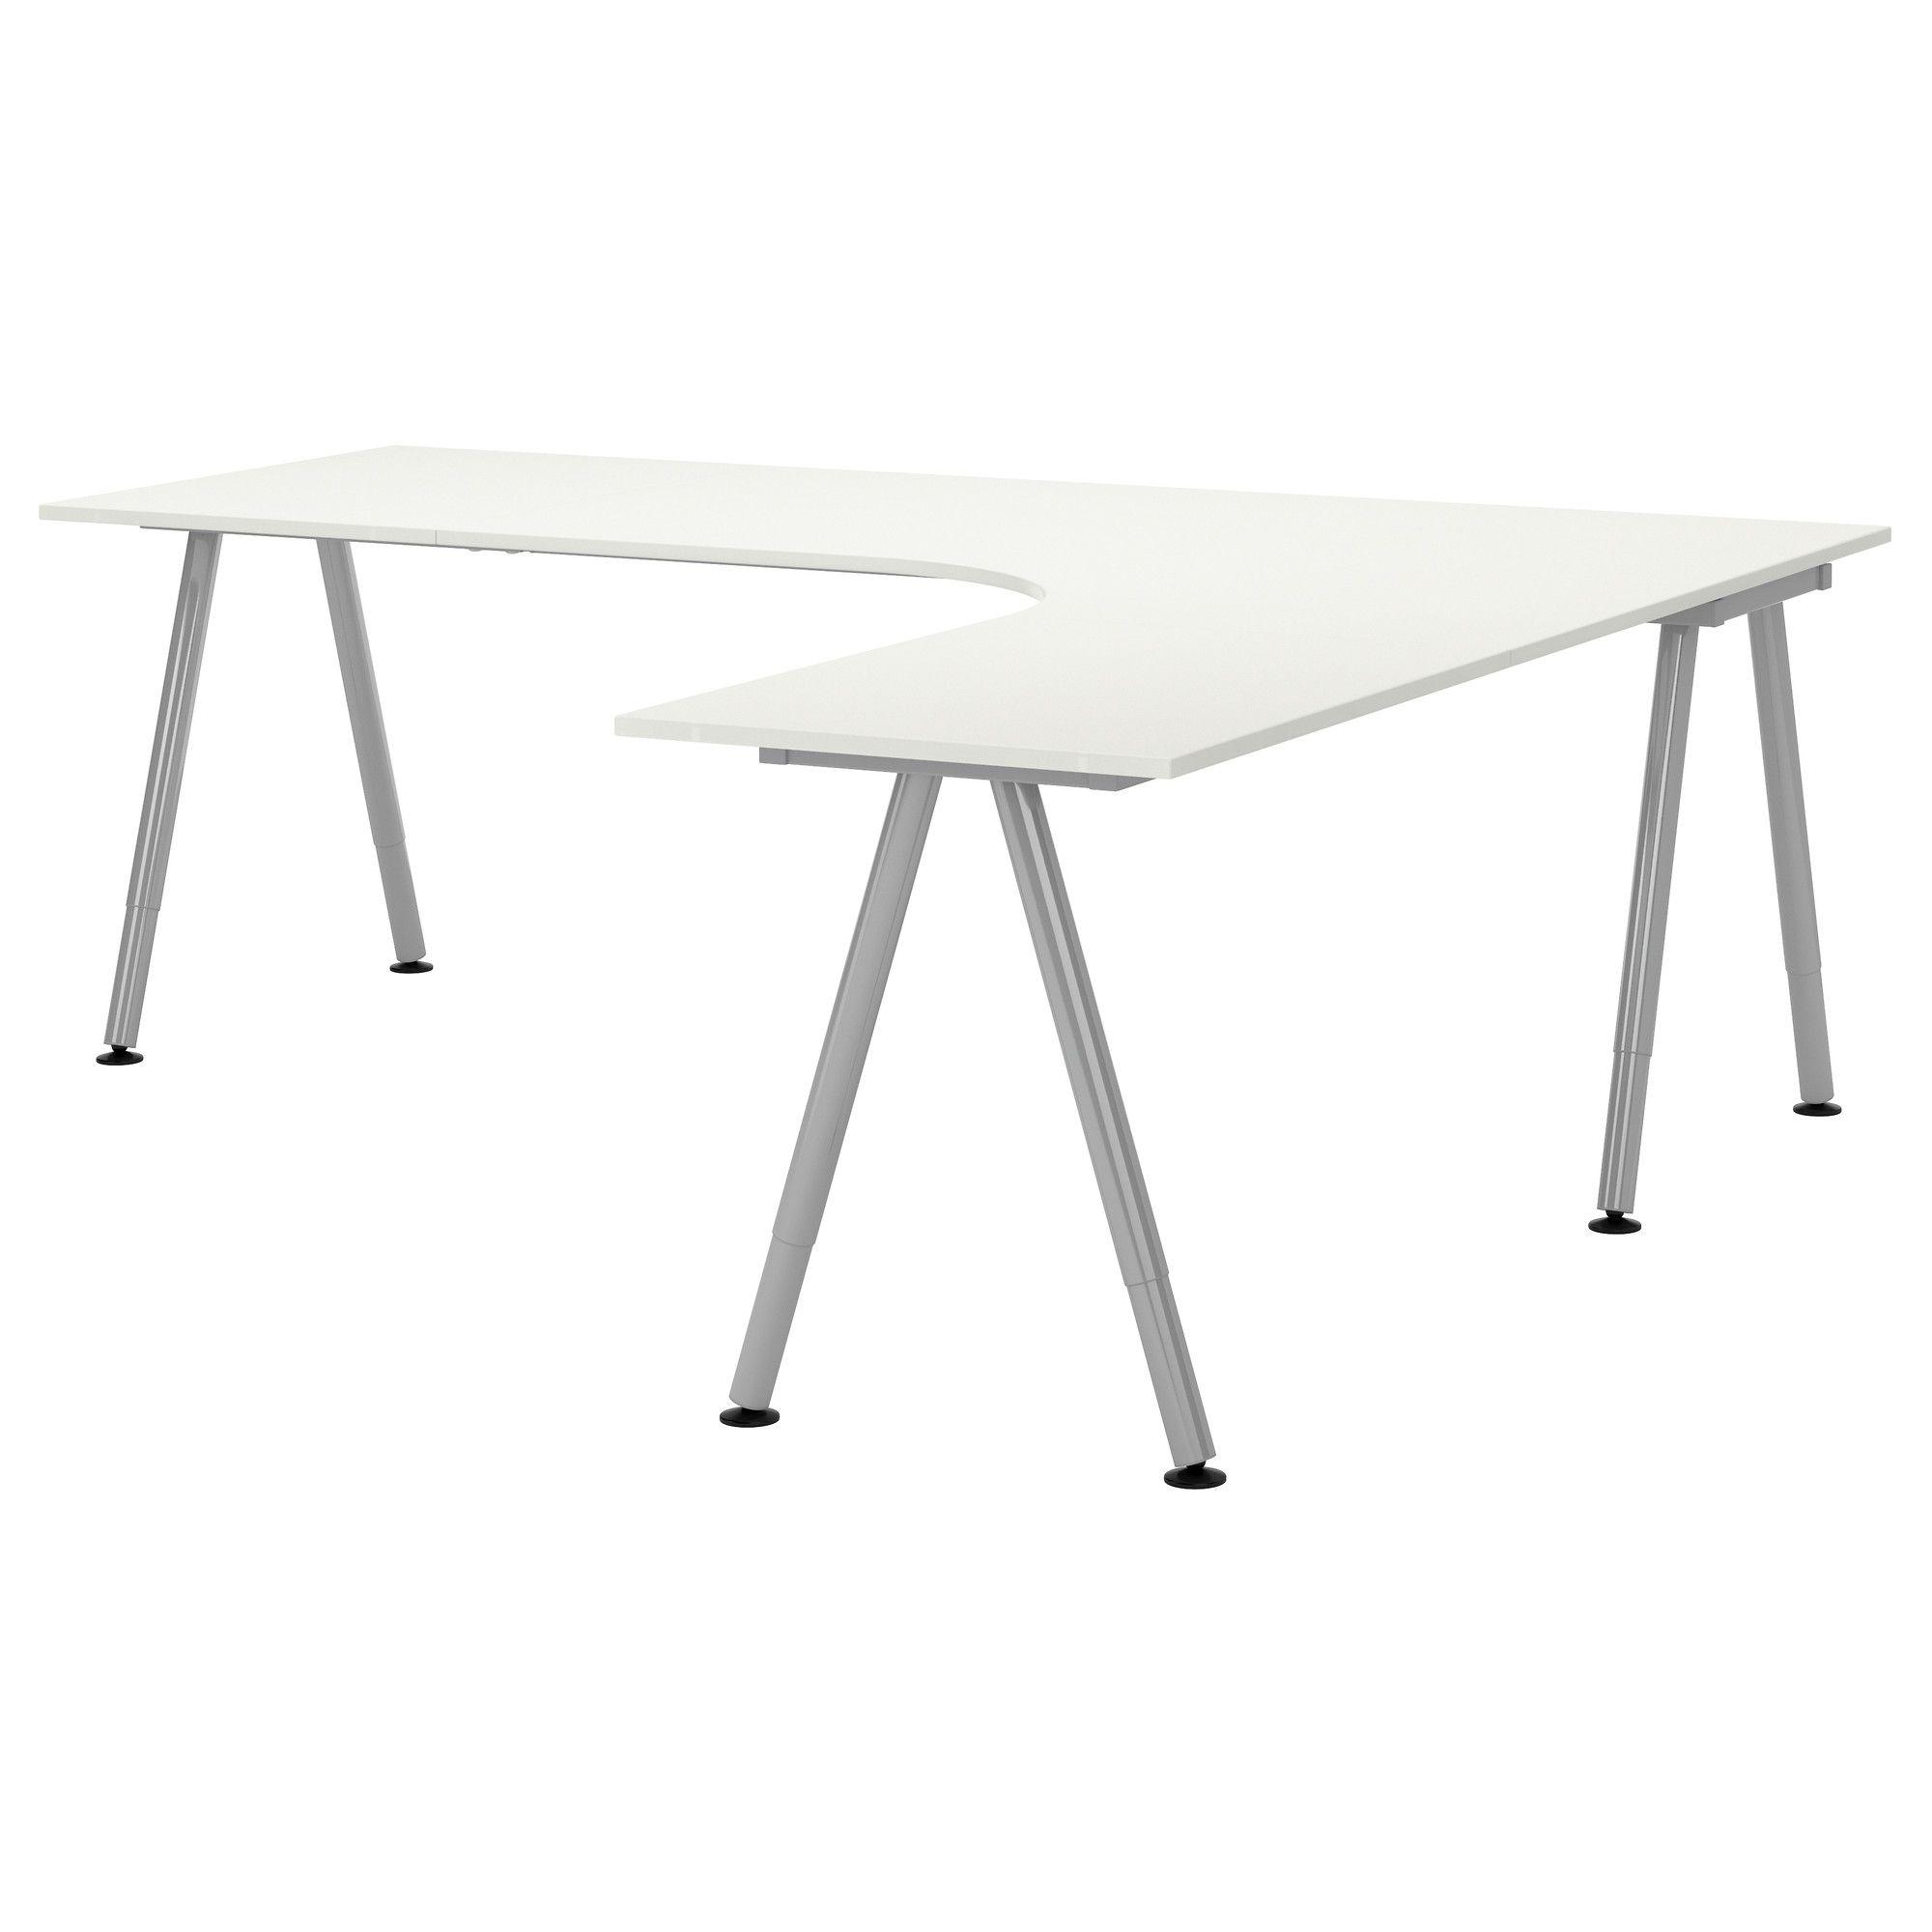 Ikea Us Furniture And Home Furnishings Ikea White Desk Ikea Ikea Desk